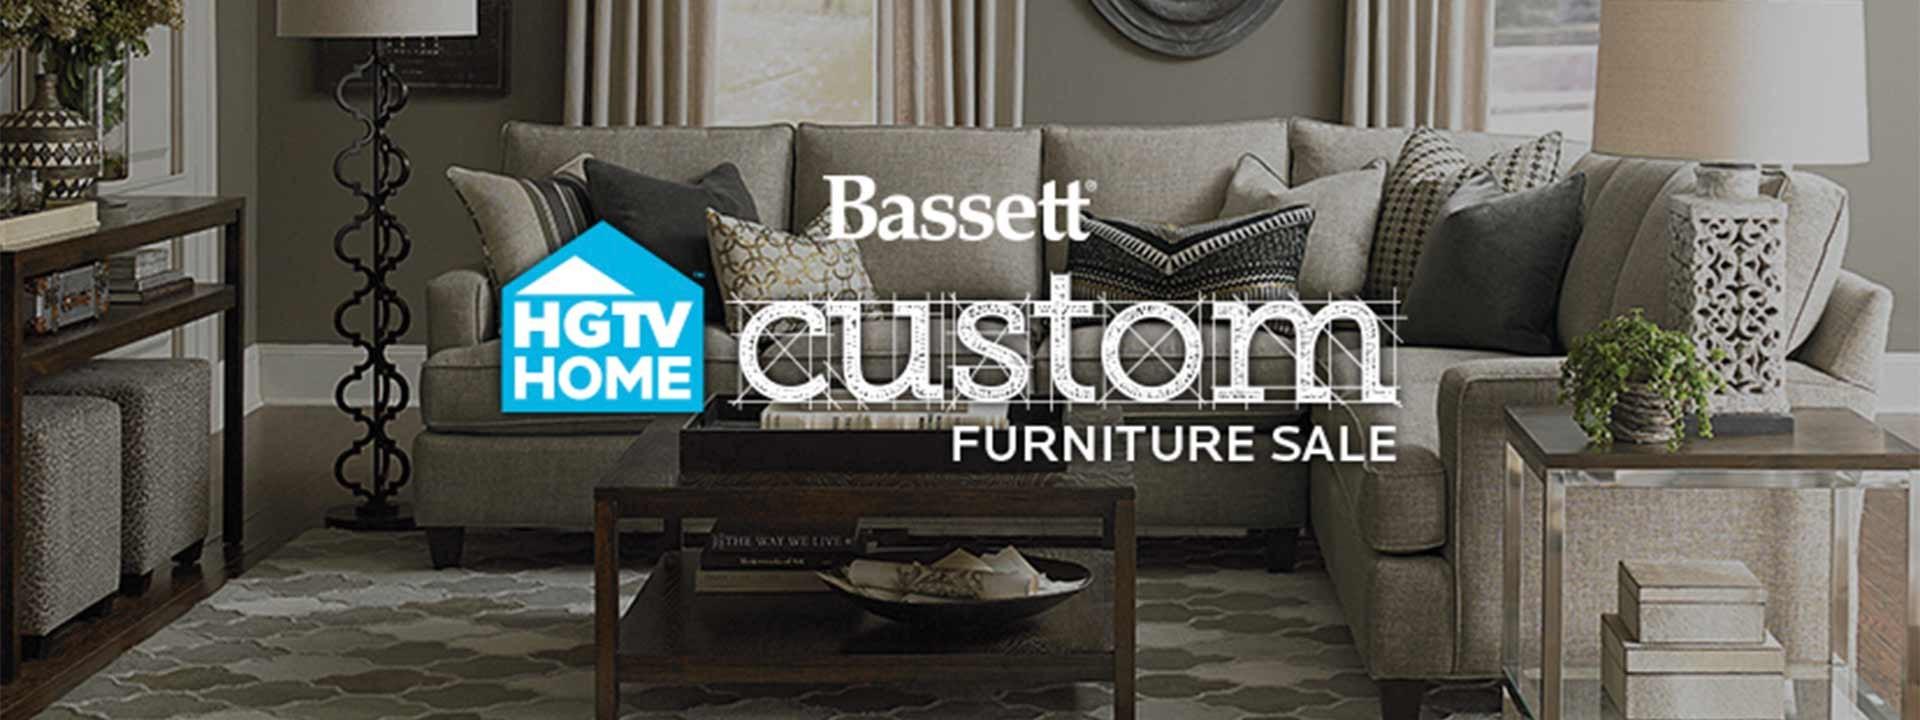 Shop HGTV Home customizable furniture by Bassett